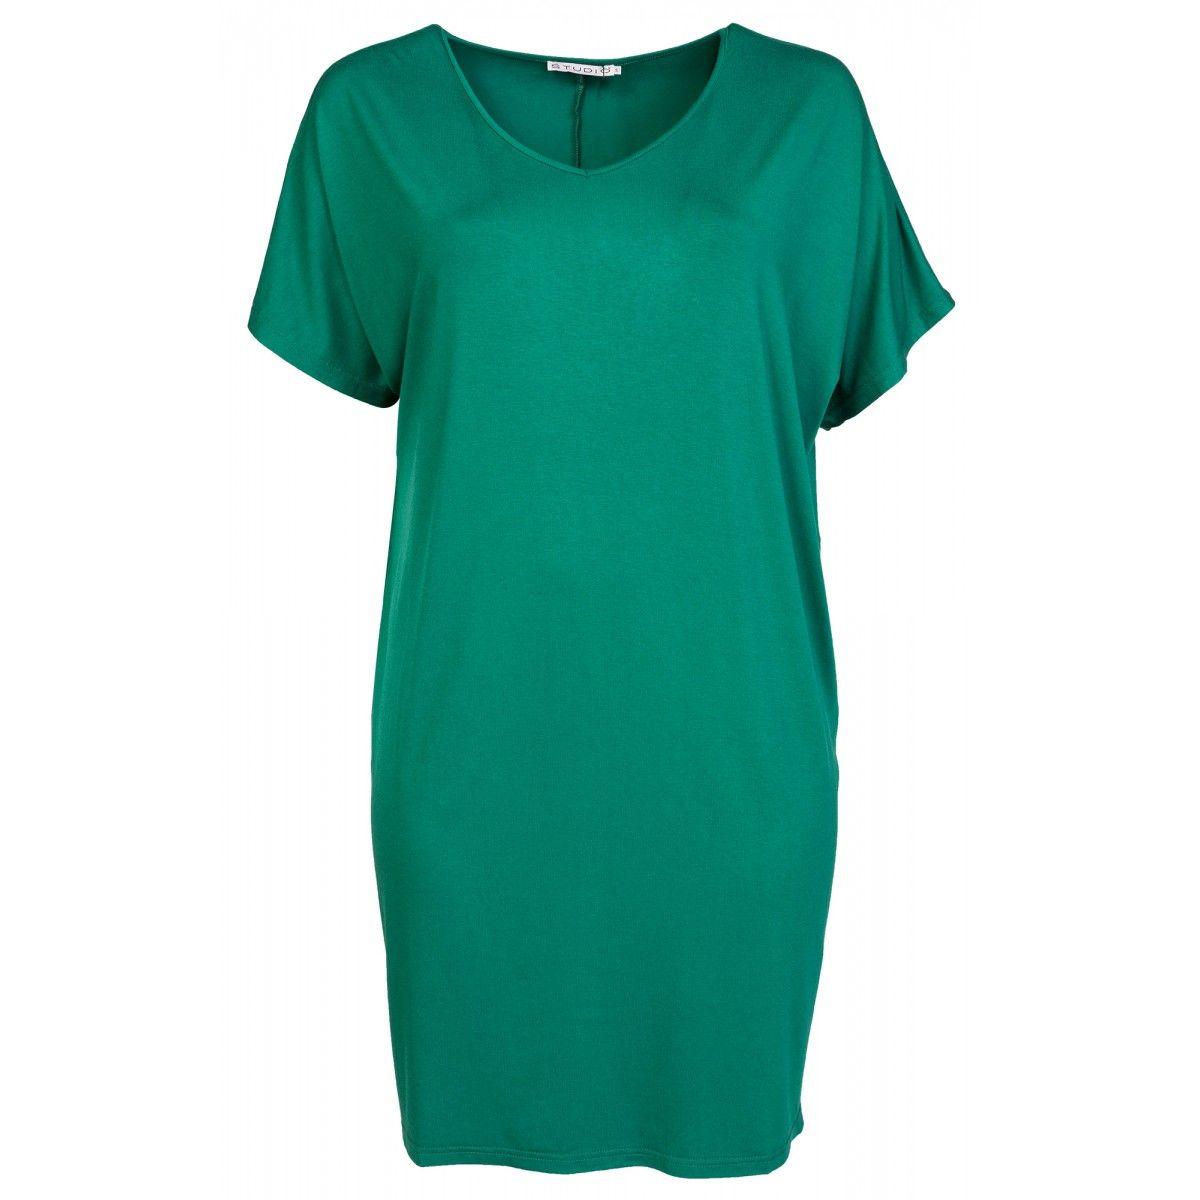 Oversize kjole i mørkegrøn viskose jersey